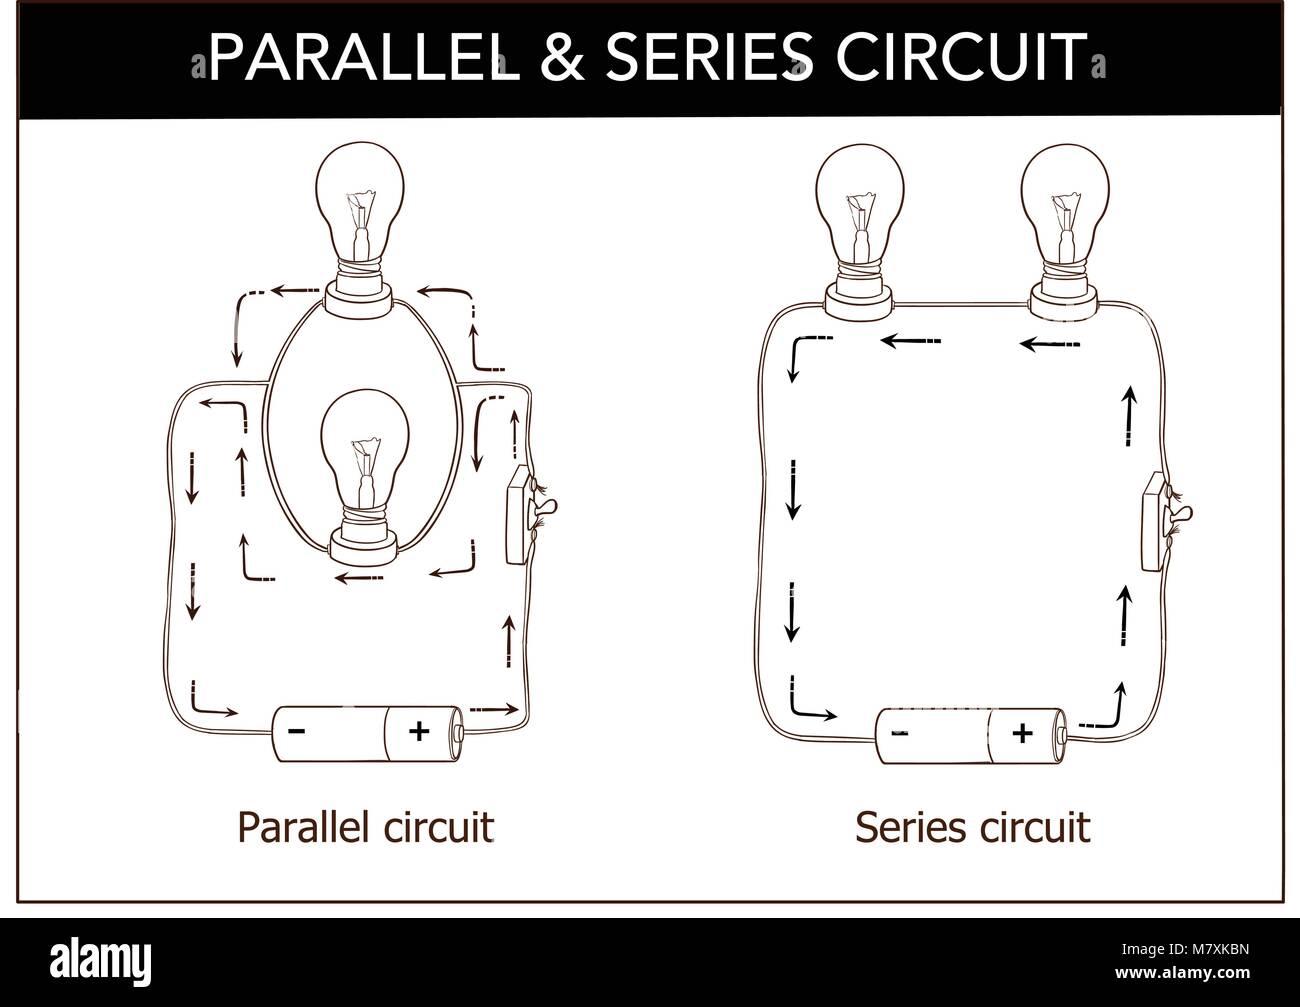 Circuito Seri E Paralelo : Ilustración vectorial de circuitos en serie y en paralelo